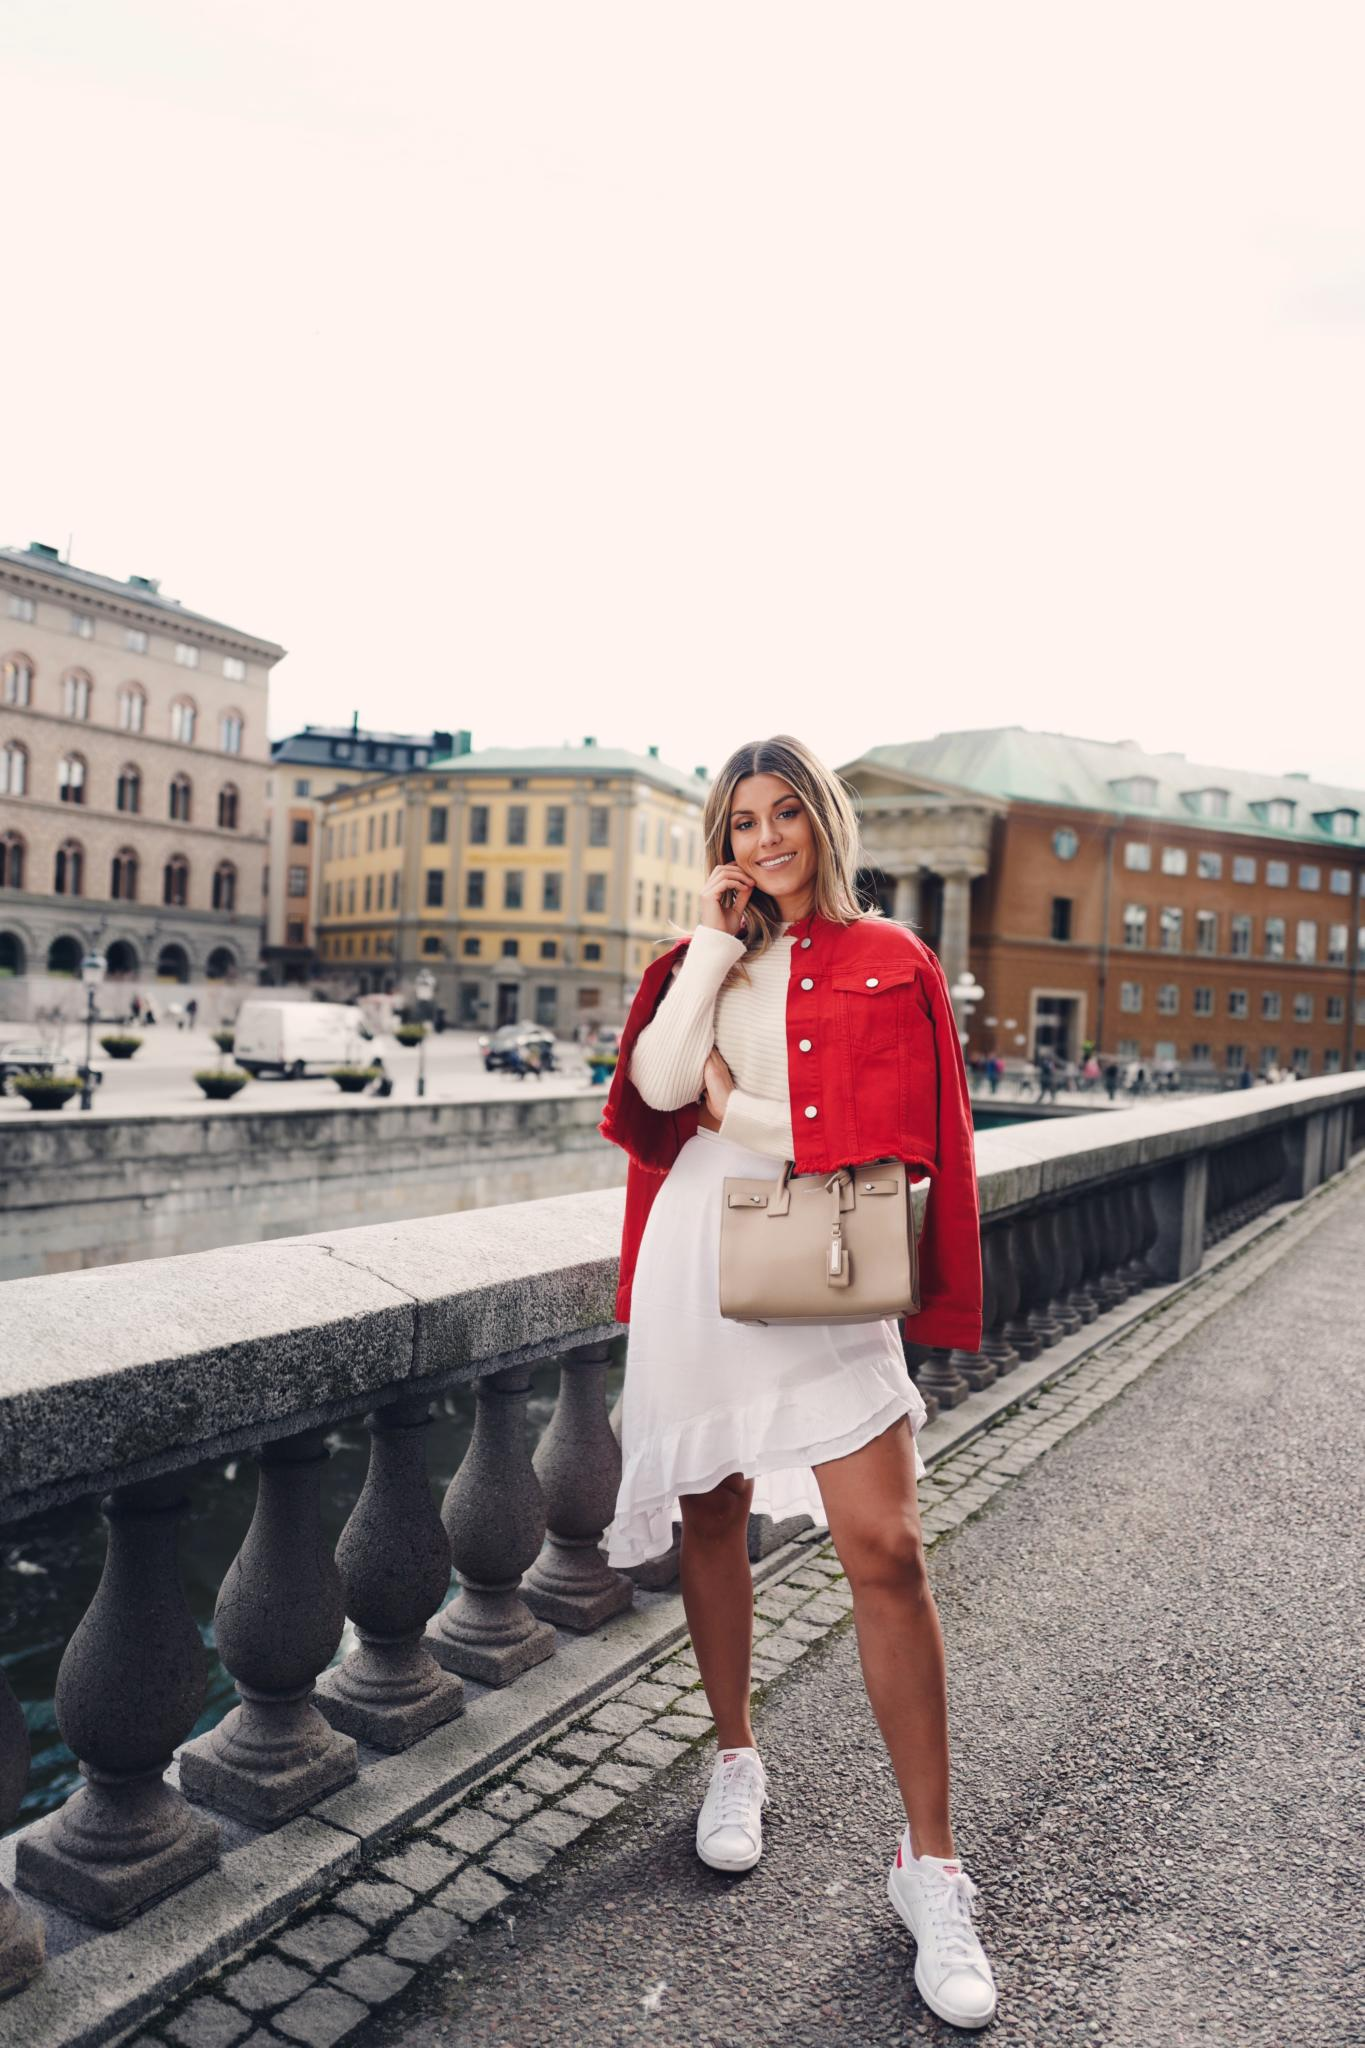 Bianca Ingrosso » INGROSSO20 FOR 20%